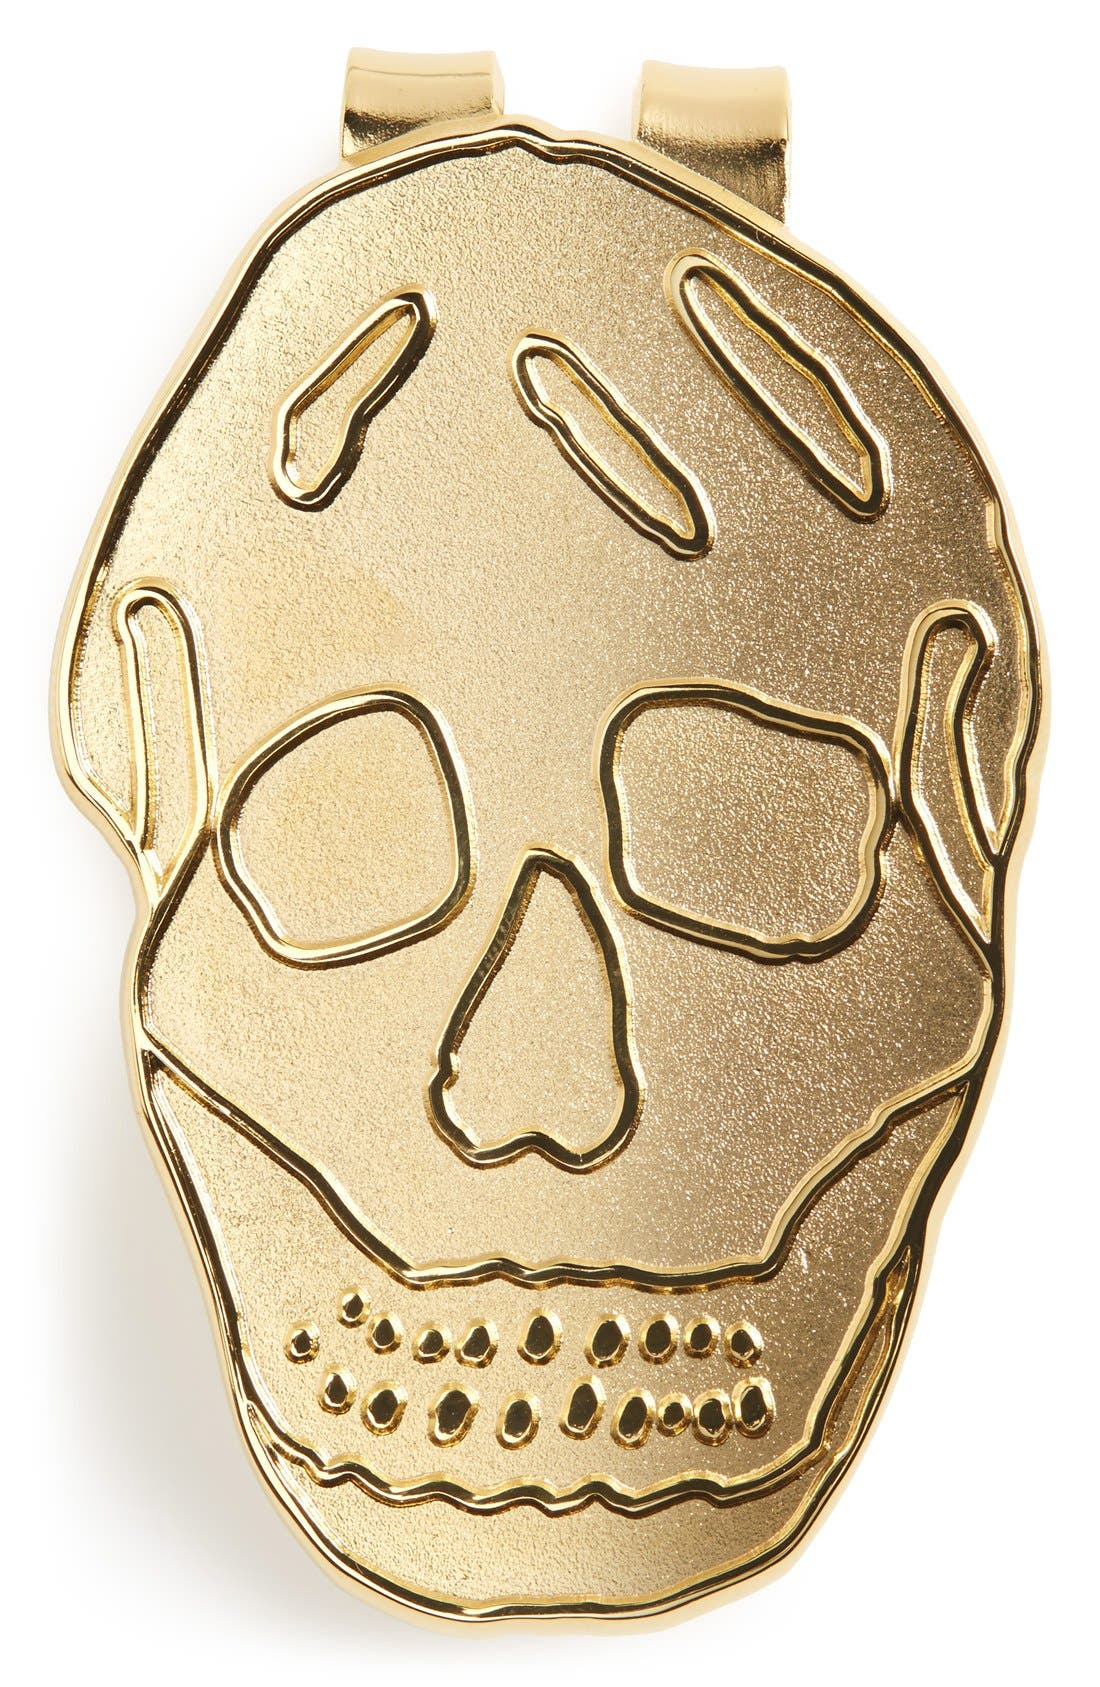 Golden Skull Money Clip,                             Main thumbnail 1, color,                             GOLD